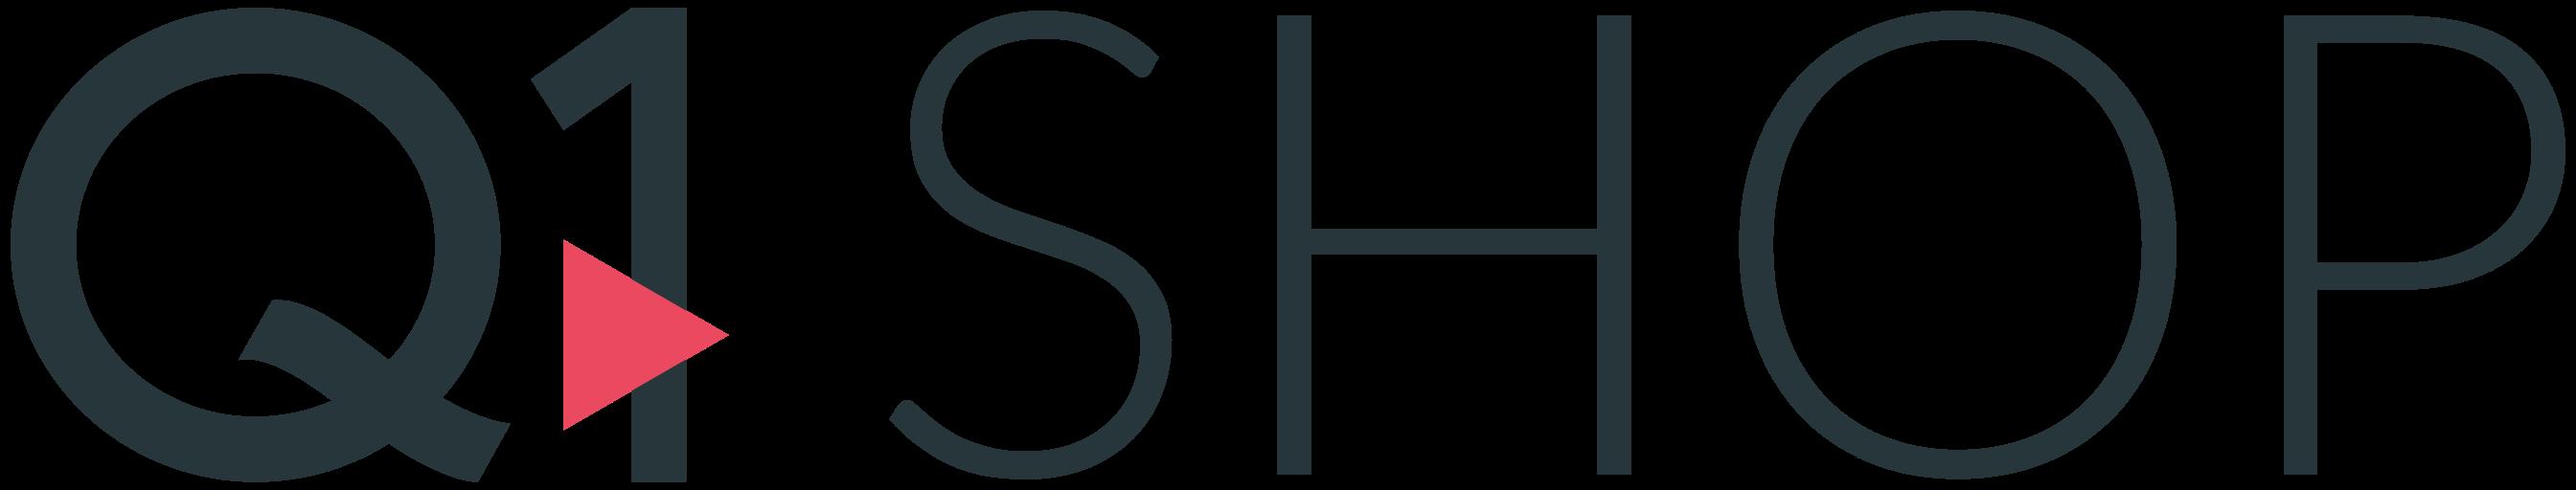 Q1Shop.it – La Dermocosmesi Italiana – Acne shop